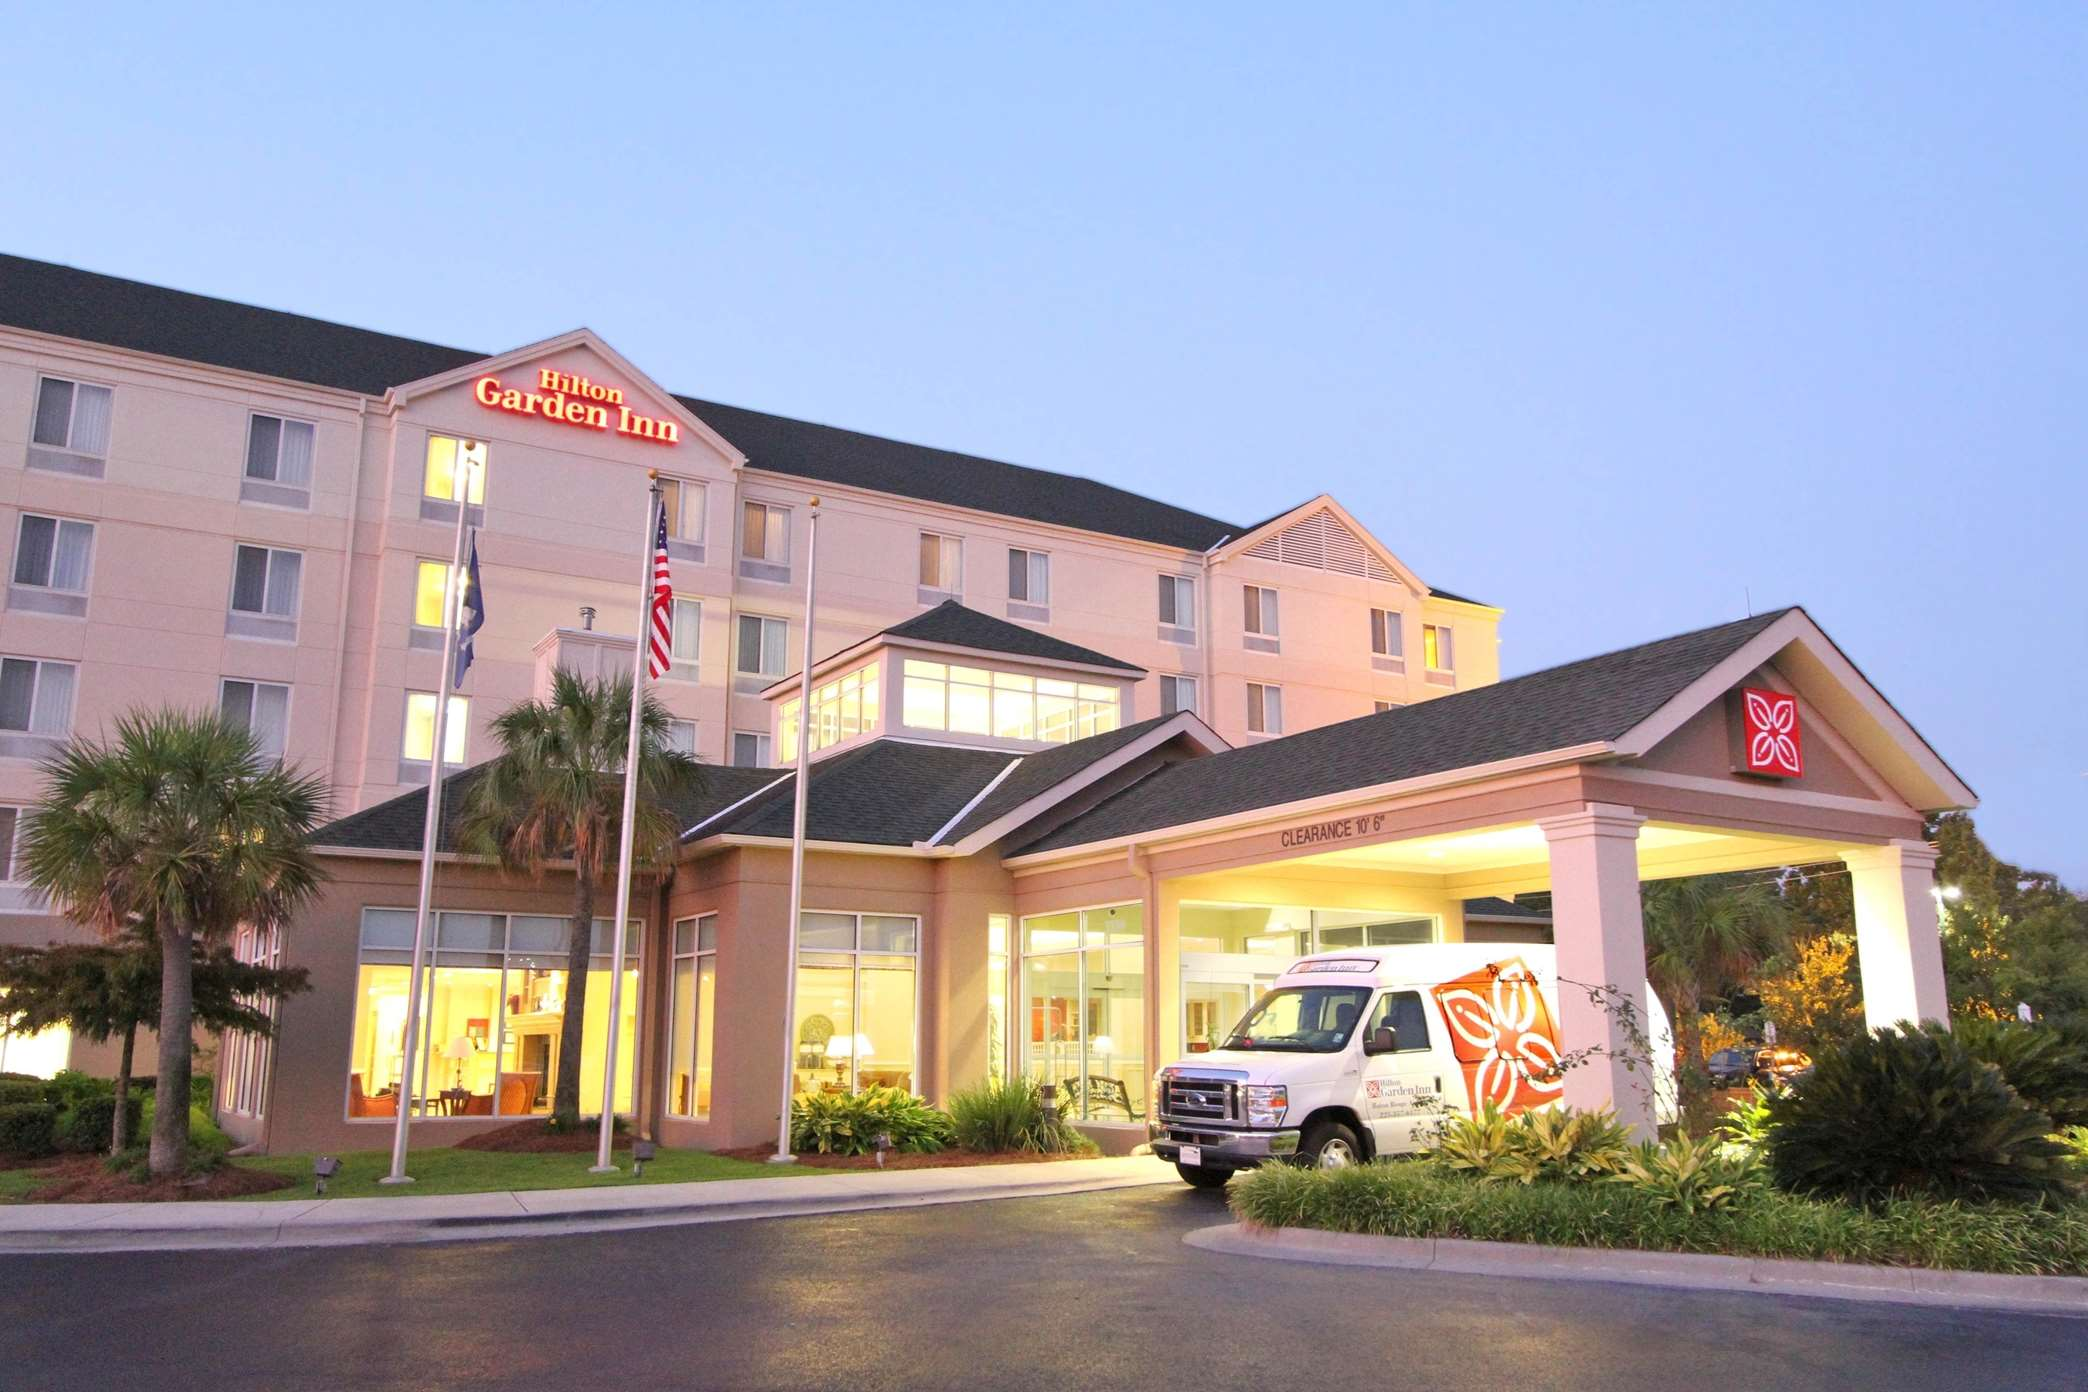 Hilton Garden Inn Baton Rouge Airport image 1